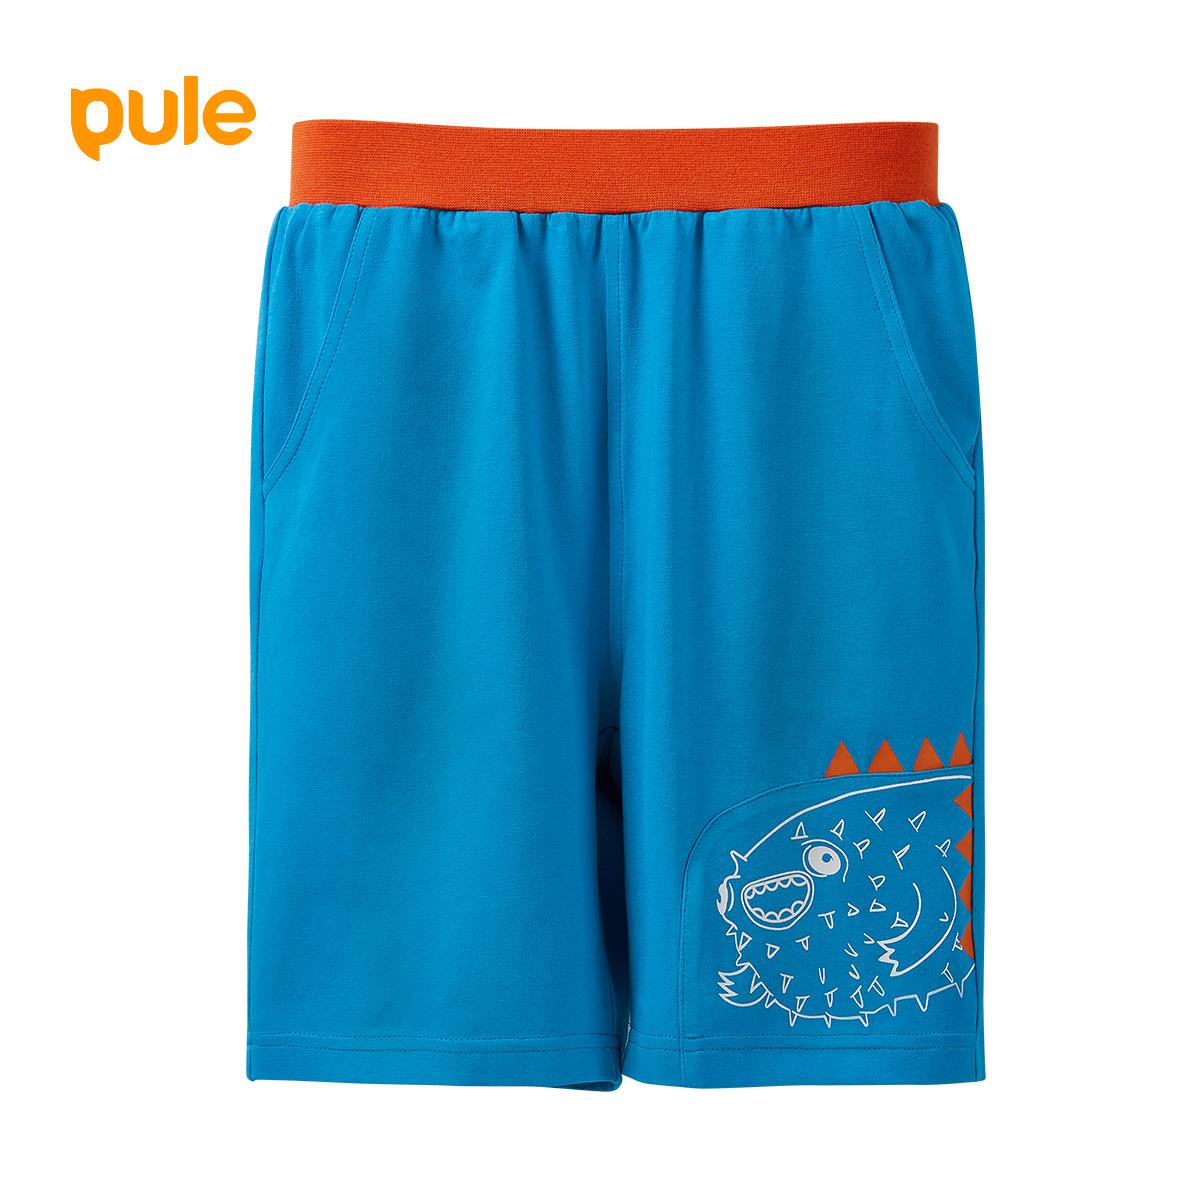 pule男童短裤夏薄款中大童儿童宝宝纯棉休闲运动裤子卡通运动童装